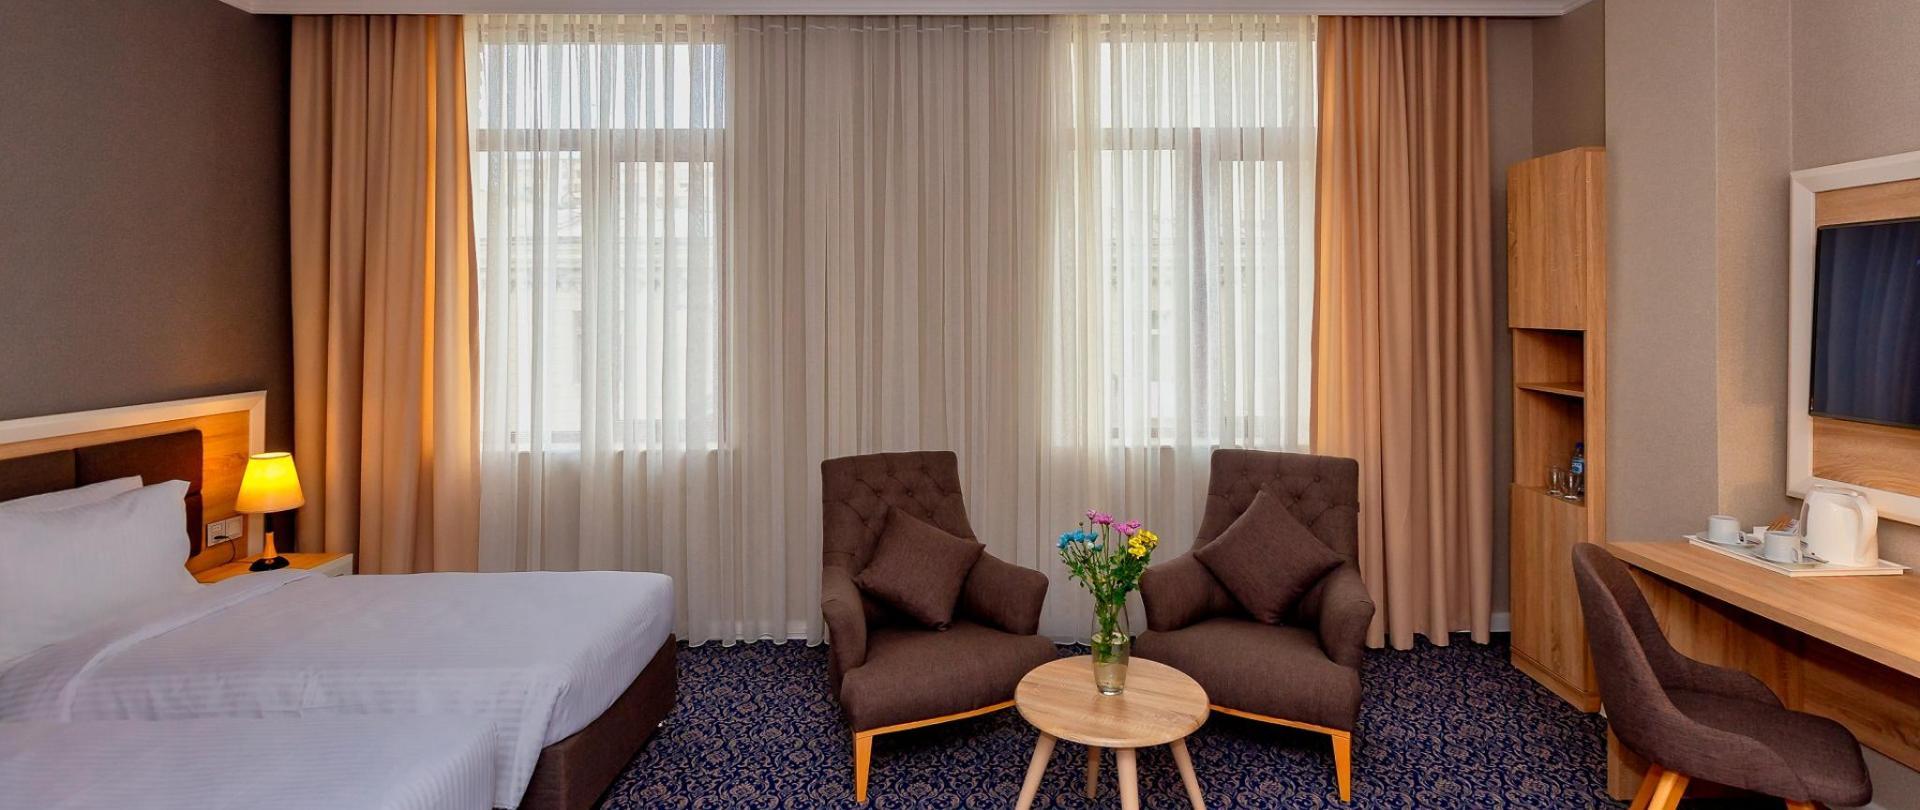 Metrocity Hotel-31.jpg